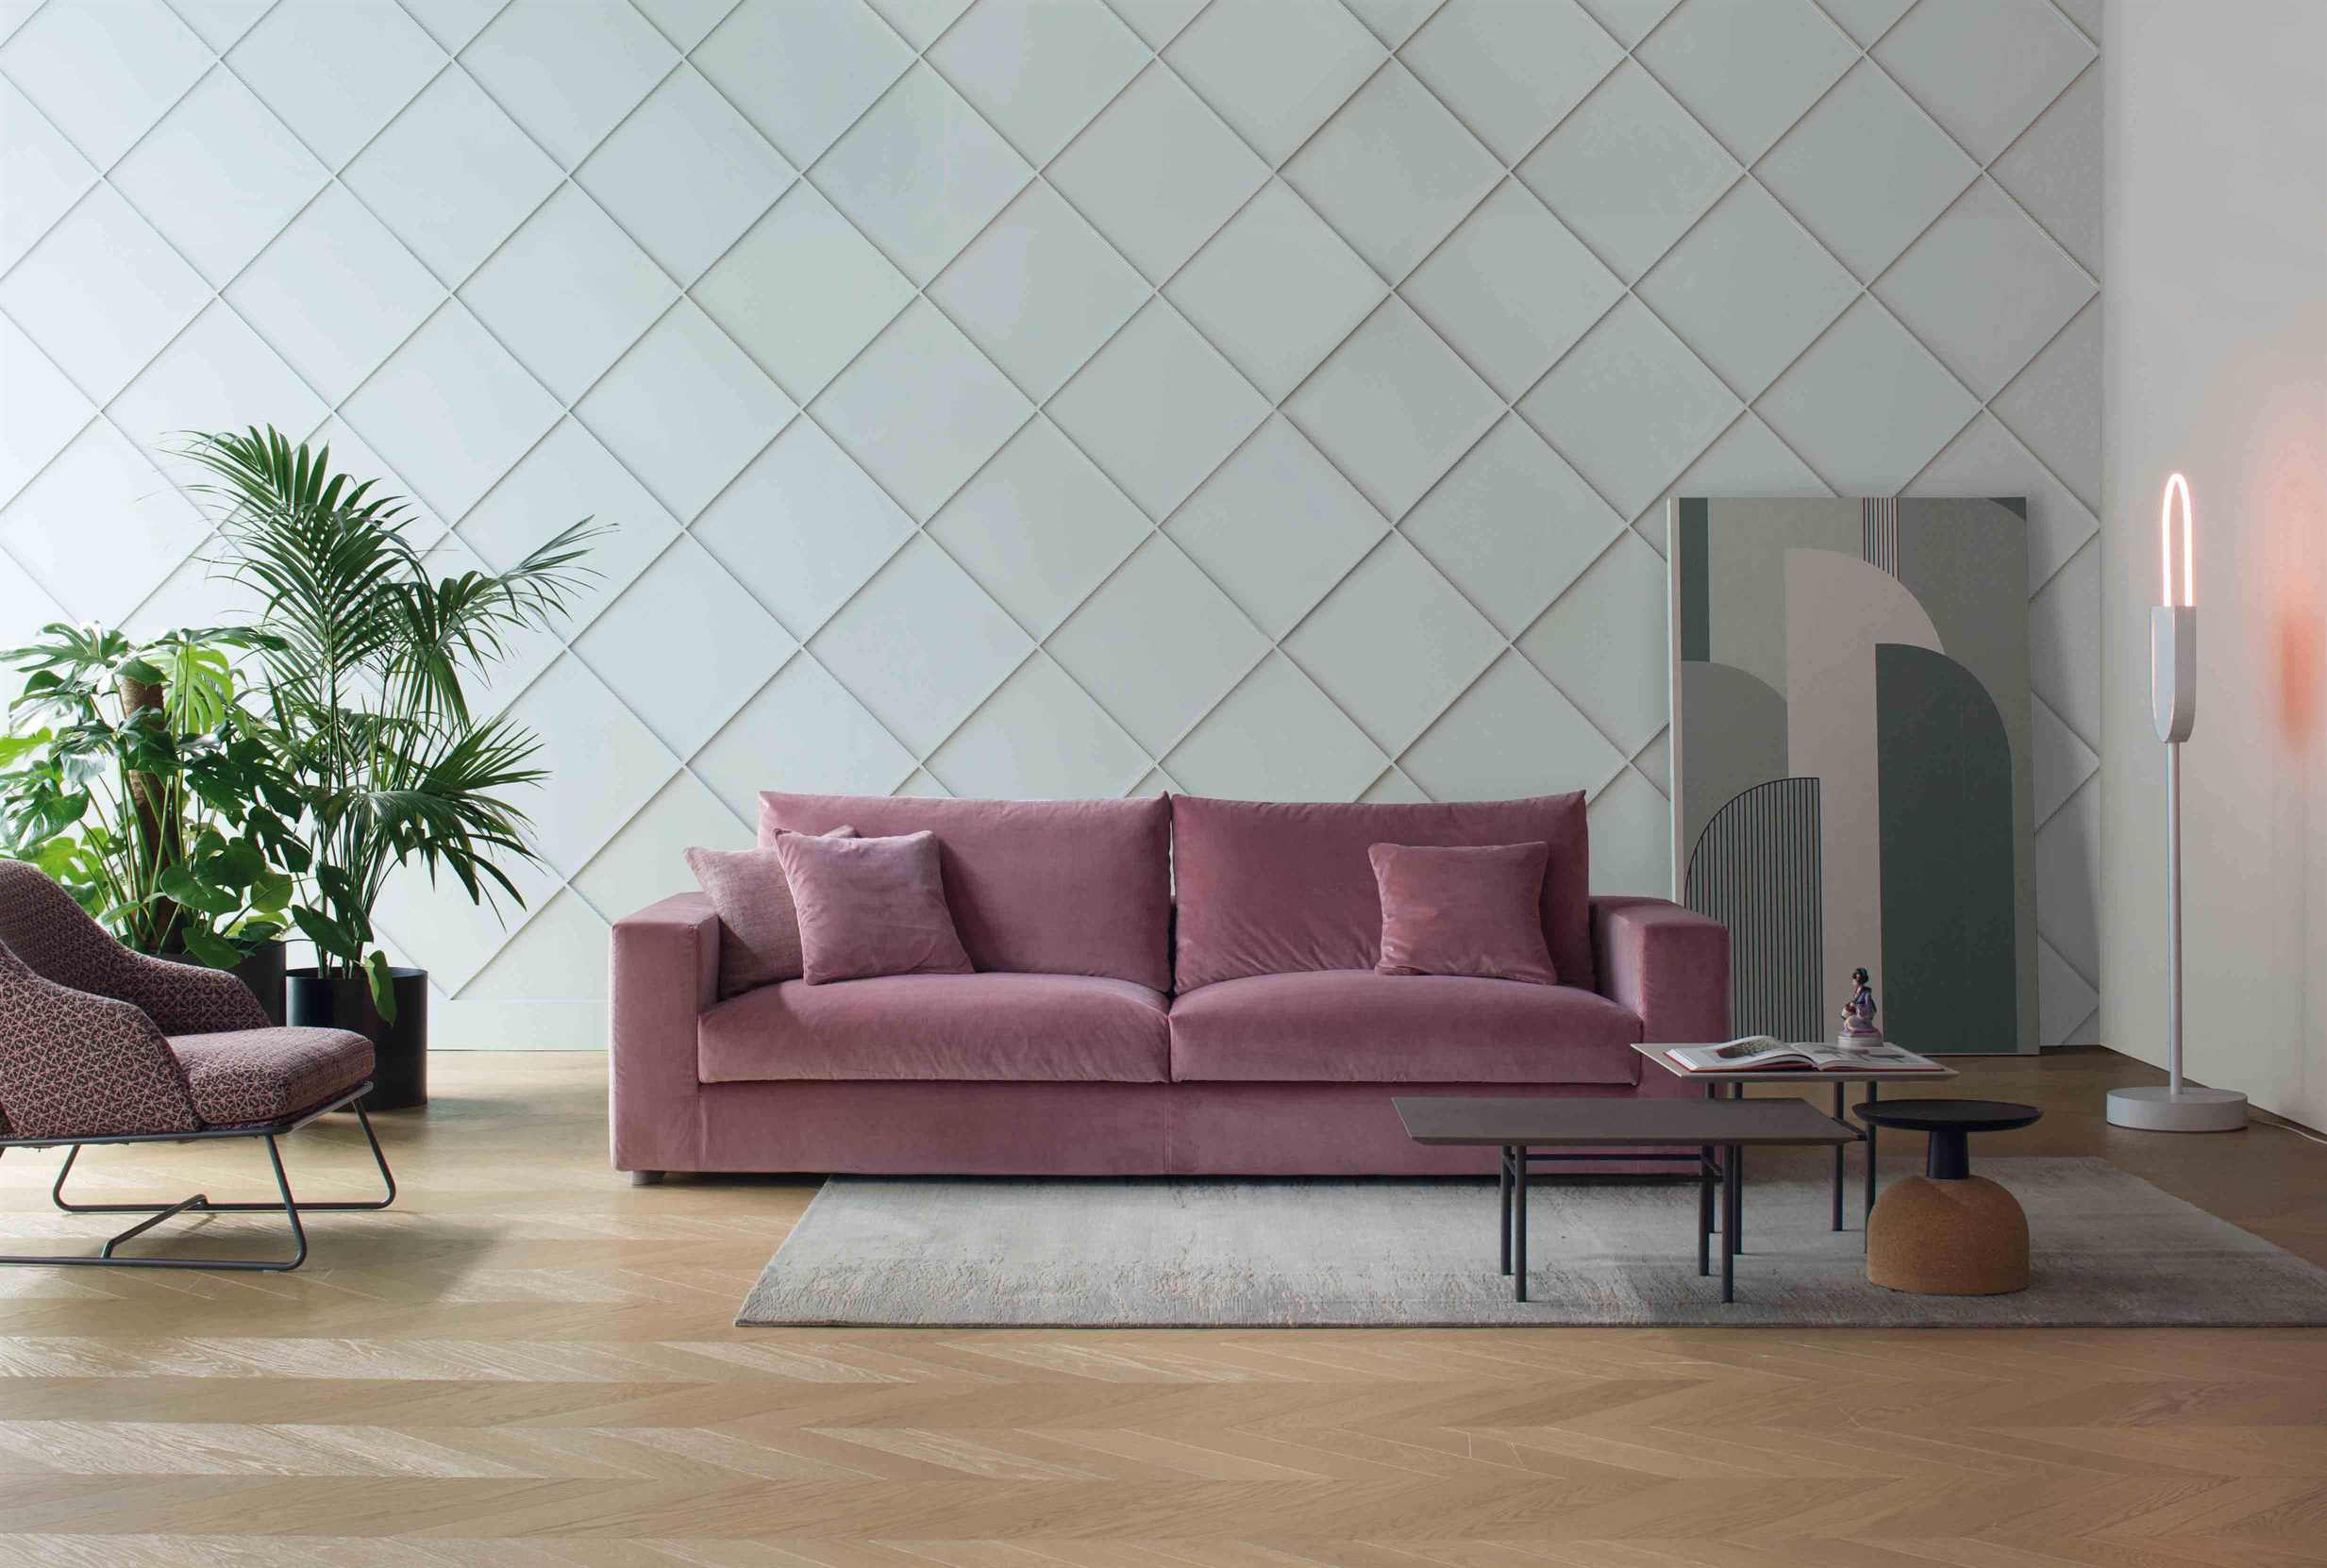 Divano hiro by bonaldo ⋆ restylit shop dreamy interiors